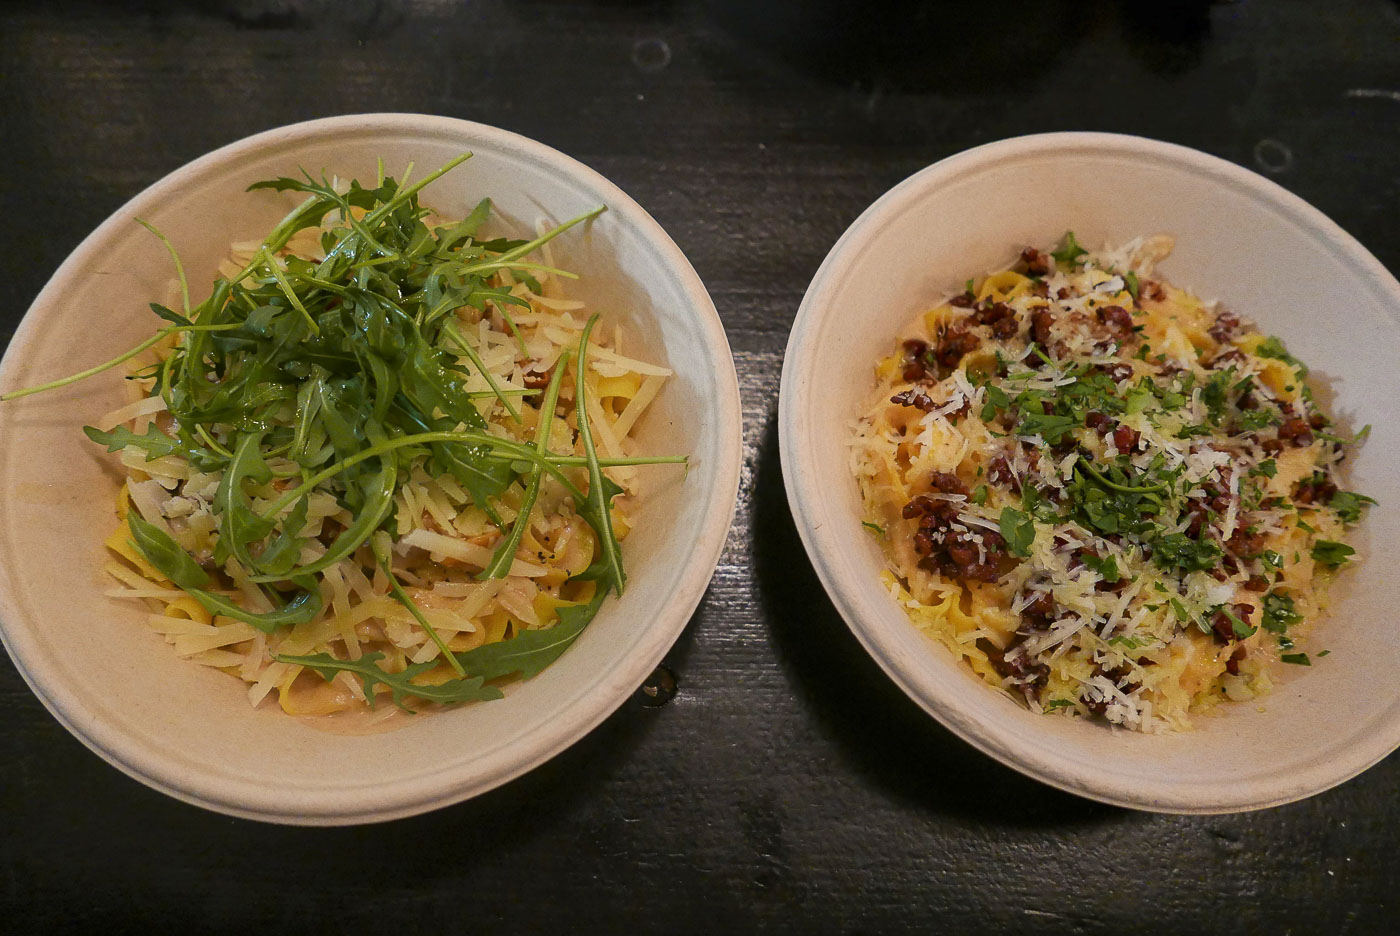 Pasta Party ved Pomodoro: (Med syndsforladelse) En pastaret mere, tak!